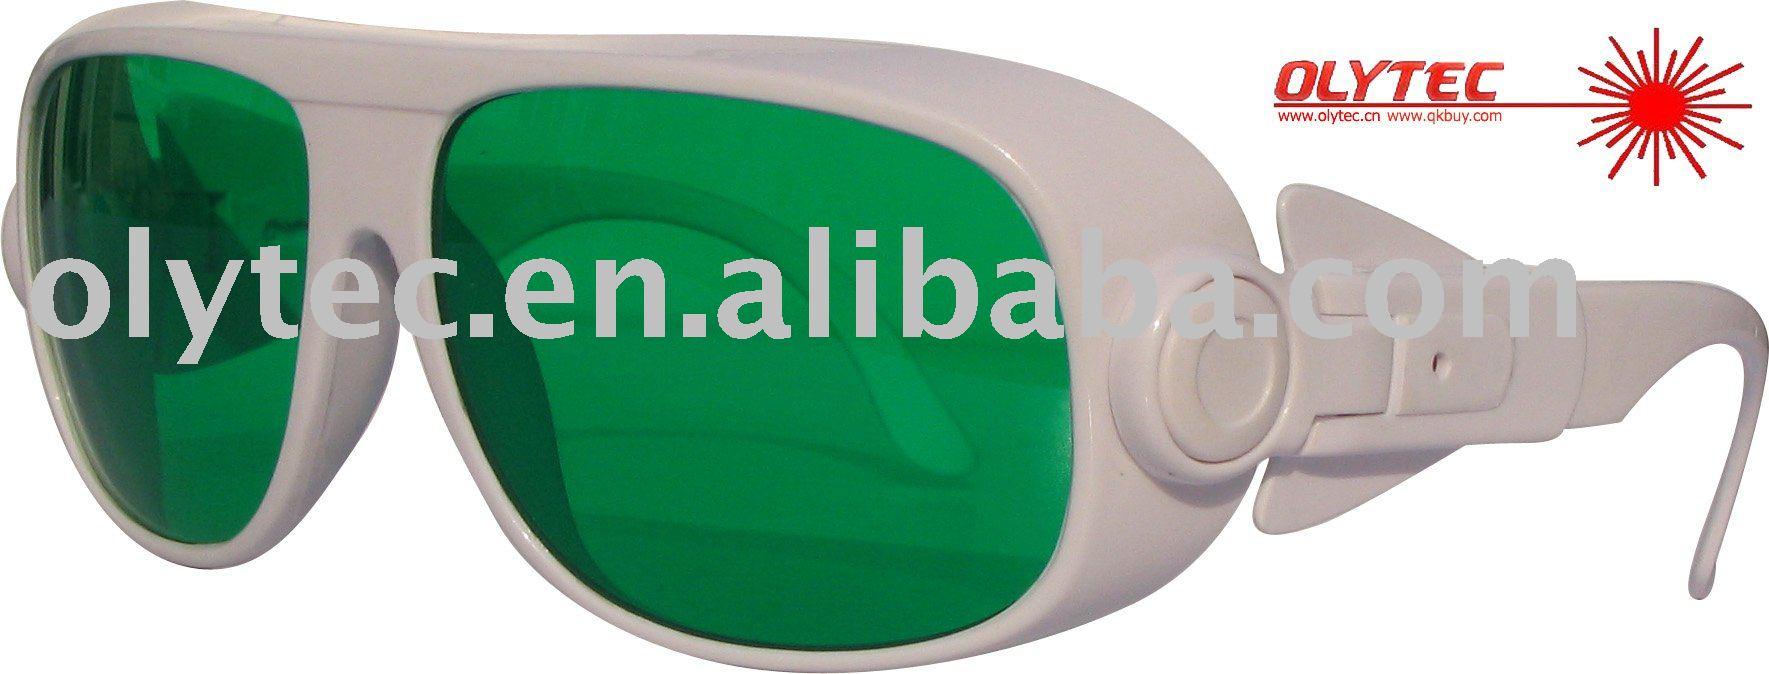 OLY-LSG-13 190-470nm &amp; 610-760nm  laser safety glasses ,CE, O.D 4+ Good V.L.T %<br>